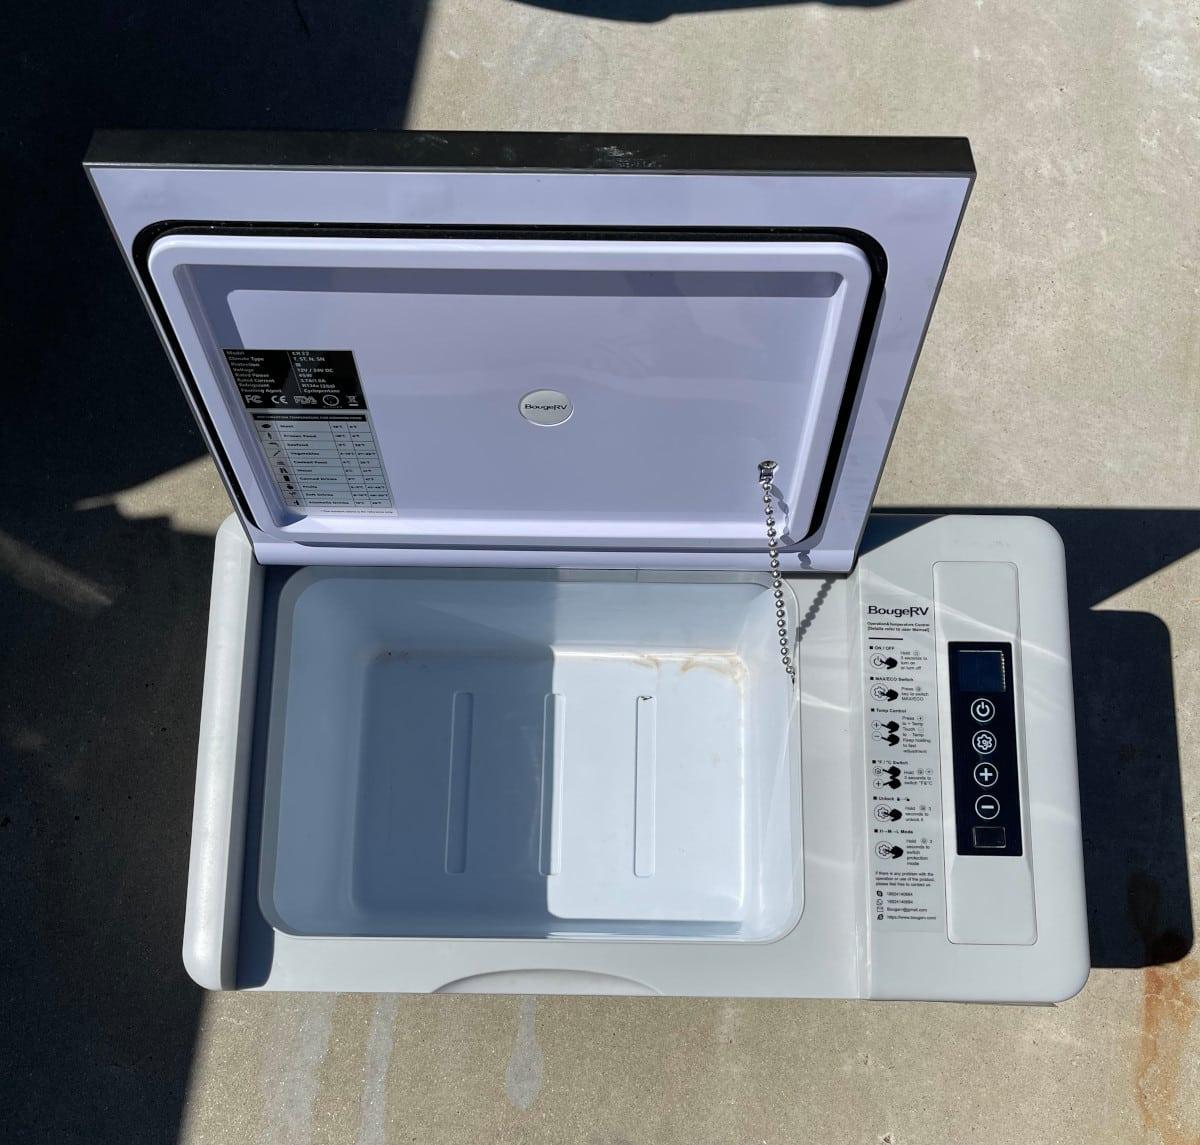 BougeRV Portable Fridge Open